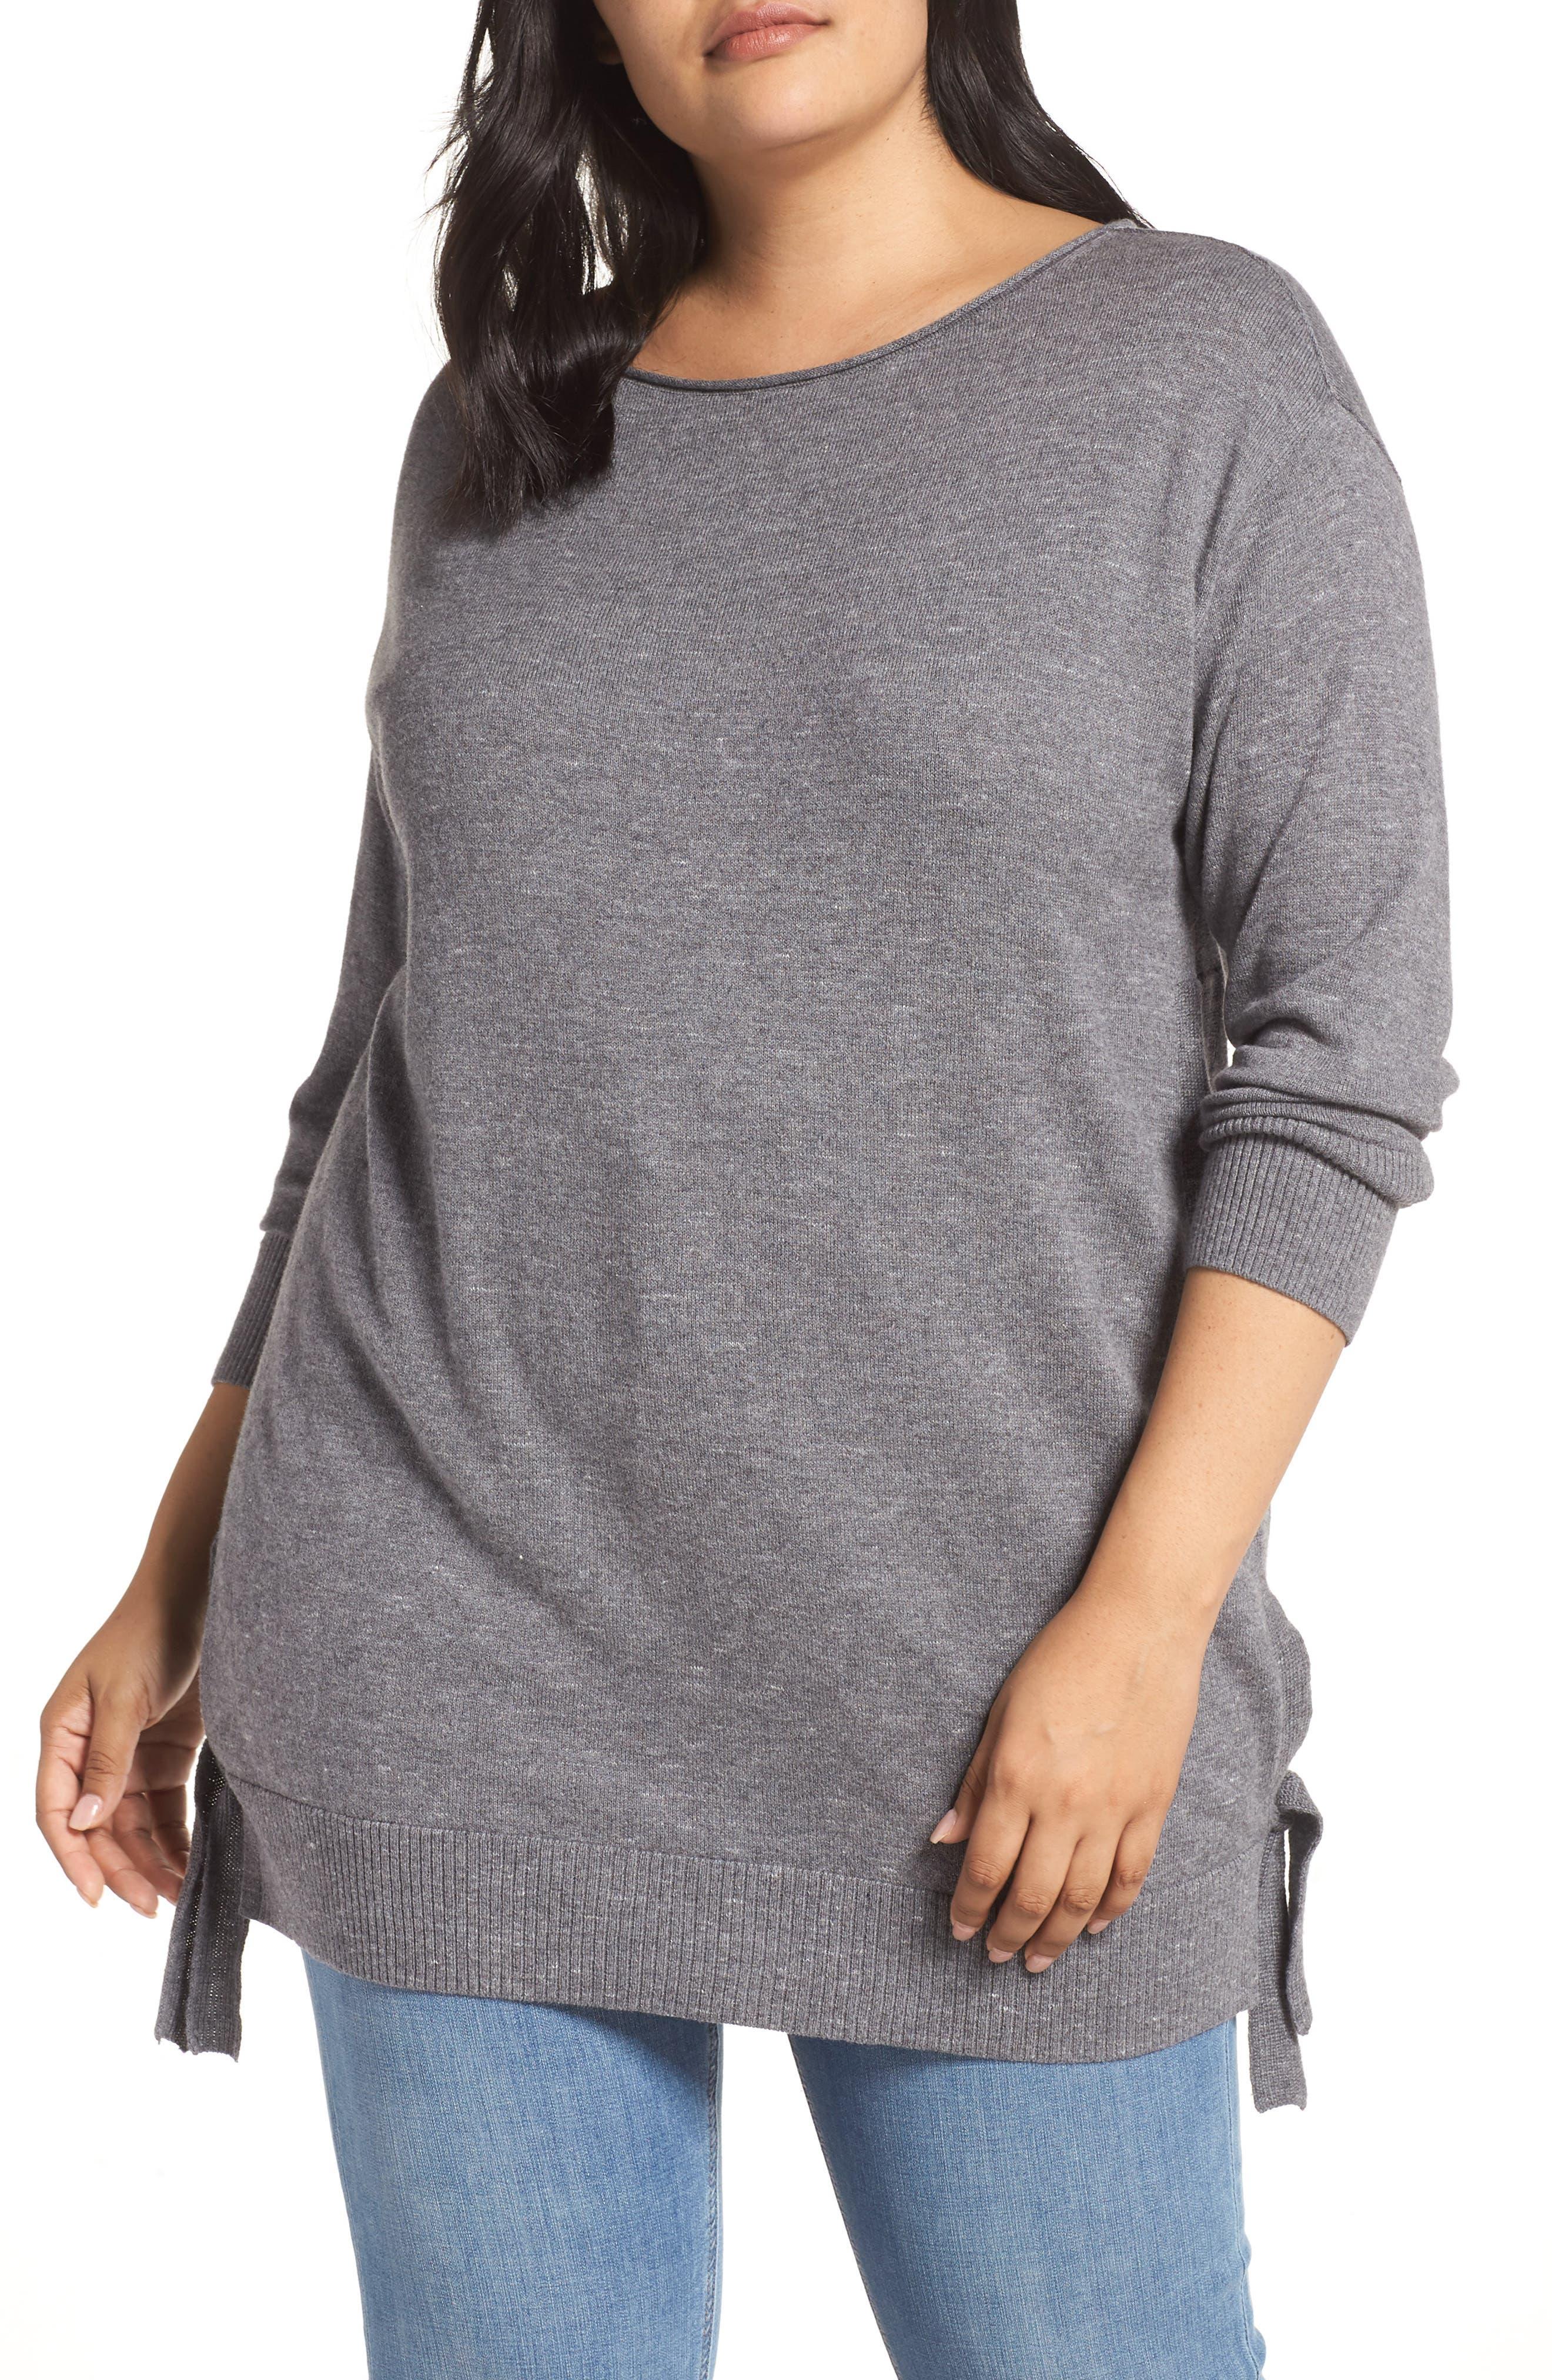 Plus Size Caslon Side Tie Detail Cotton & Wool Sweater, Grey